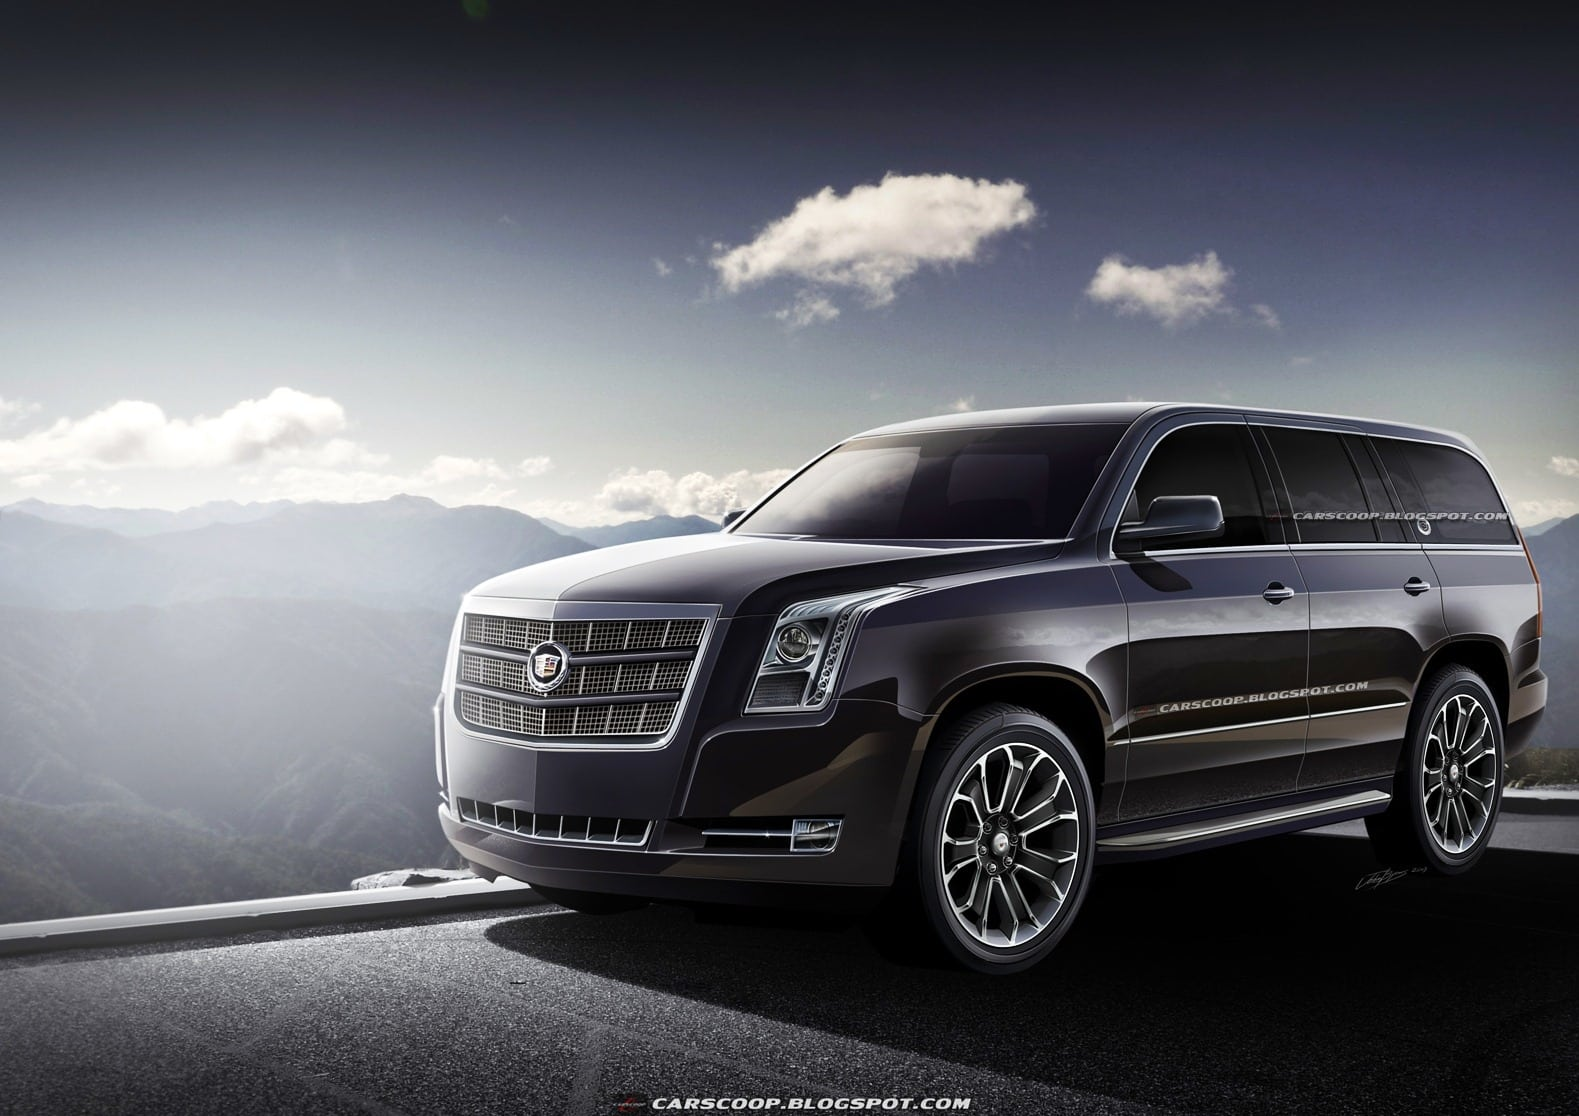 2020 Cadillac Escalade Images